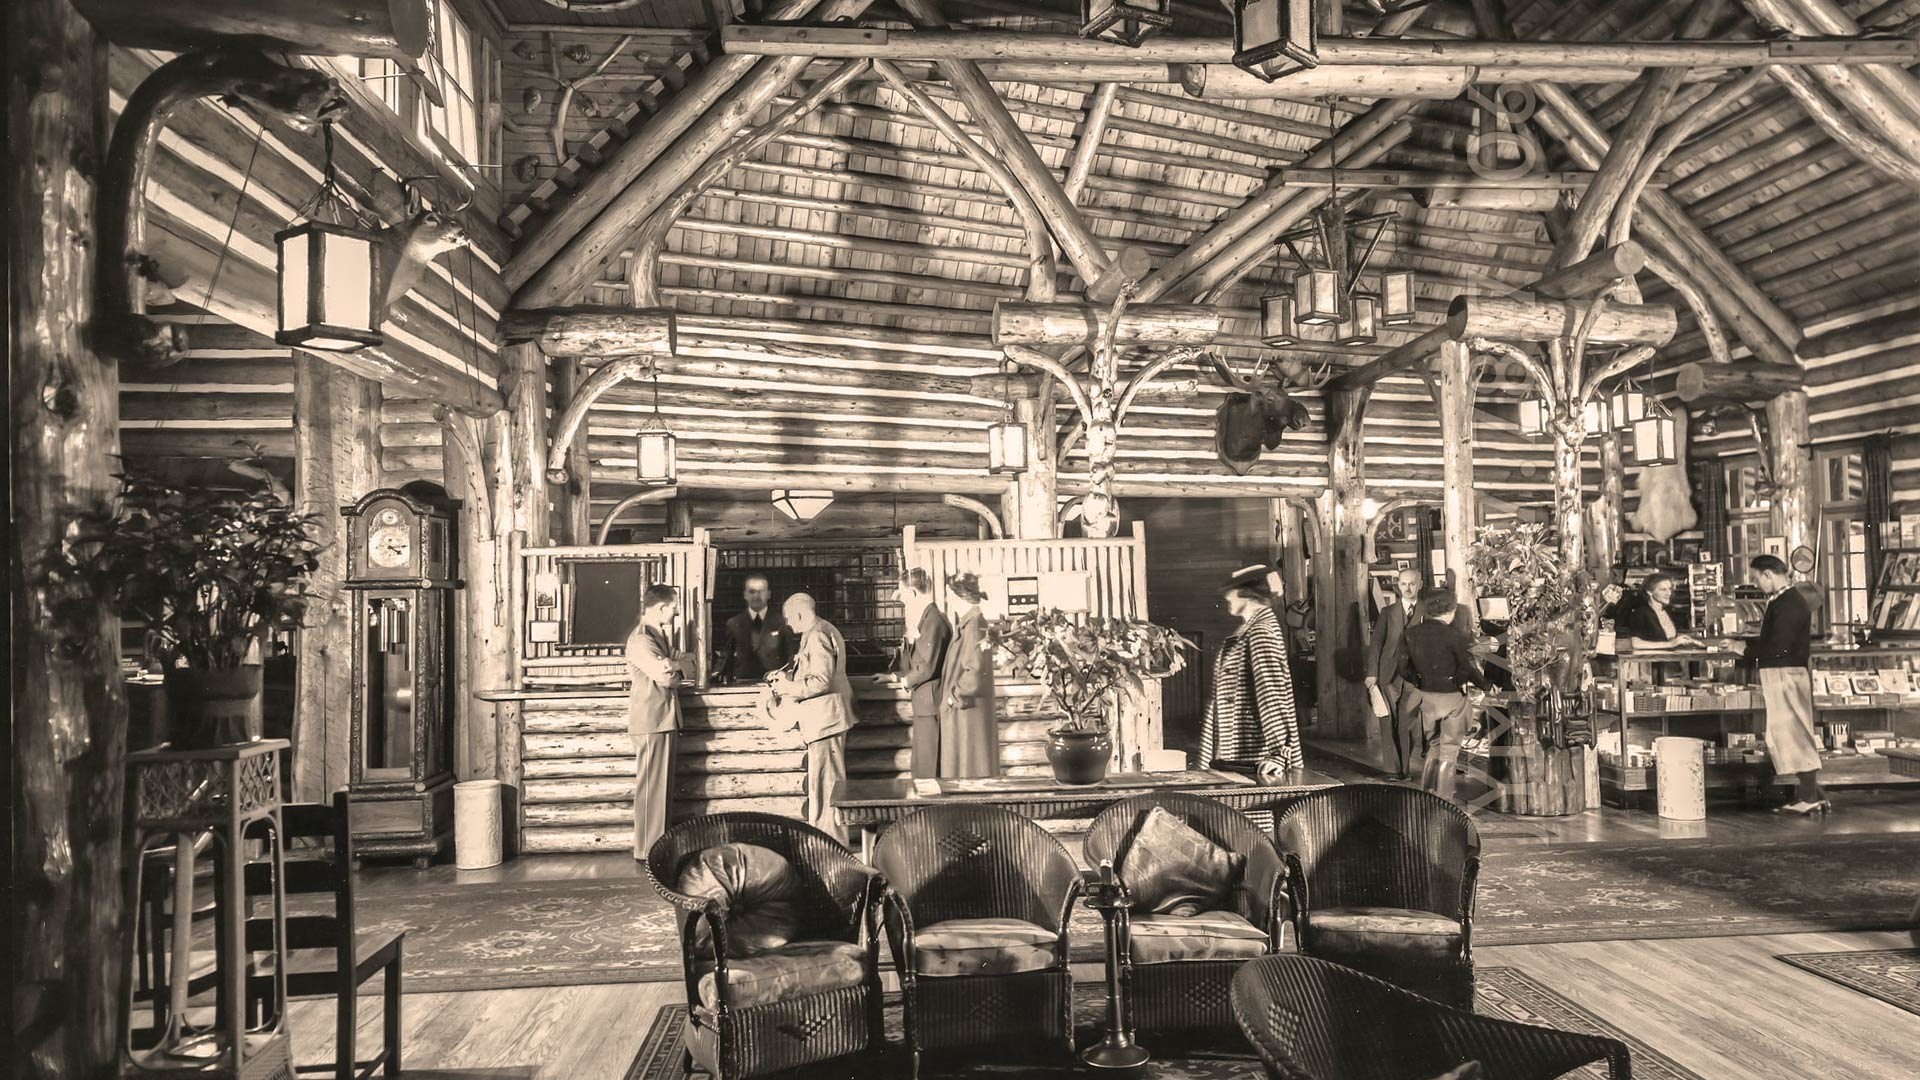 Fairmont jasper park lodge renovation for Crosby cabin jasper park lodge